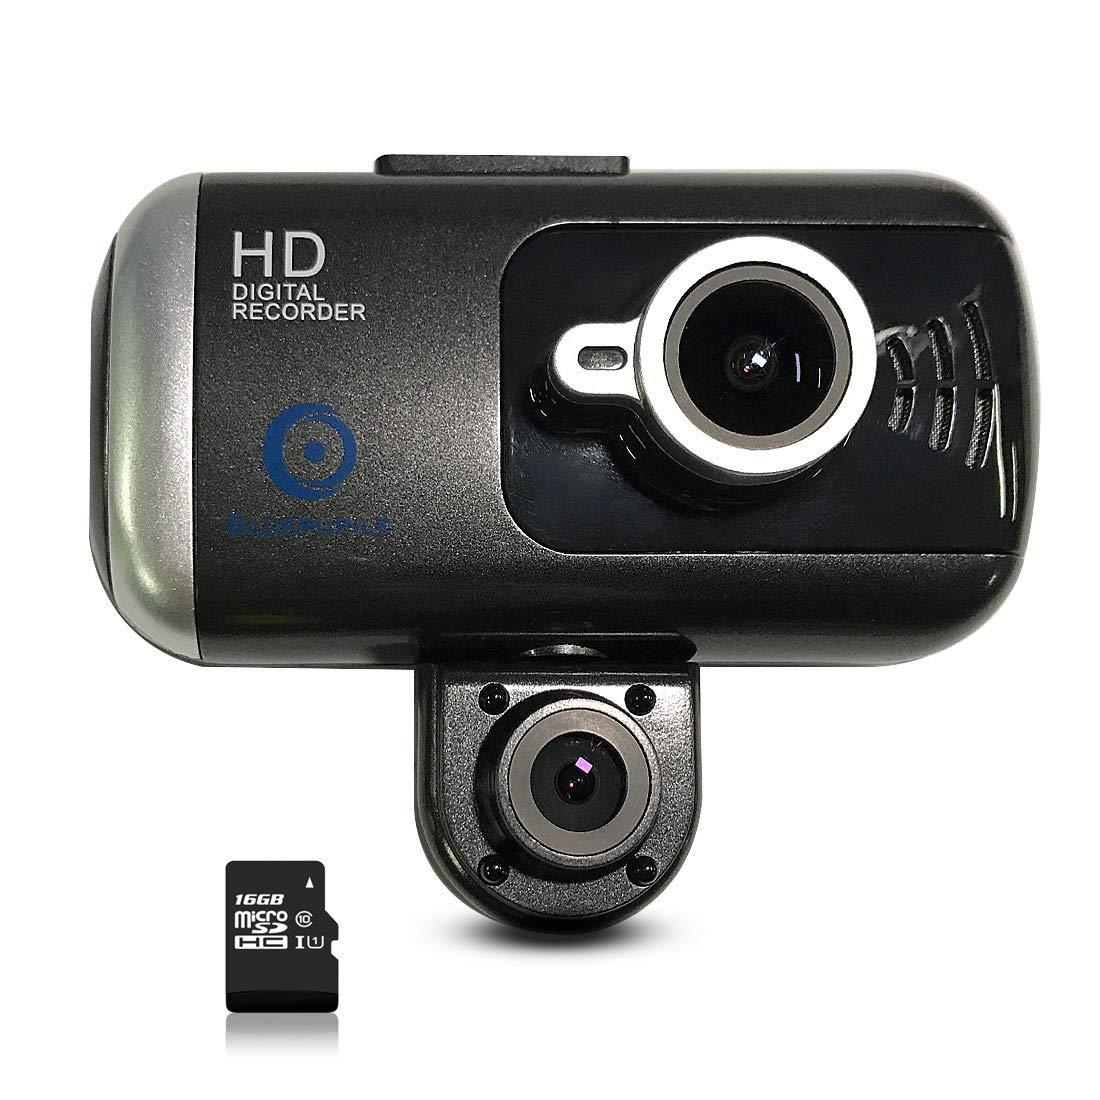 Bluepupile Dual Dash Cam with GPS, 3.0 inch Dual Camera .1080P SOS Loop Recording,HDR, Gravity Sensor,Include 16GB TF Card